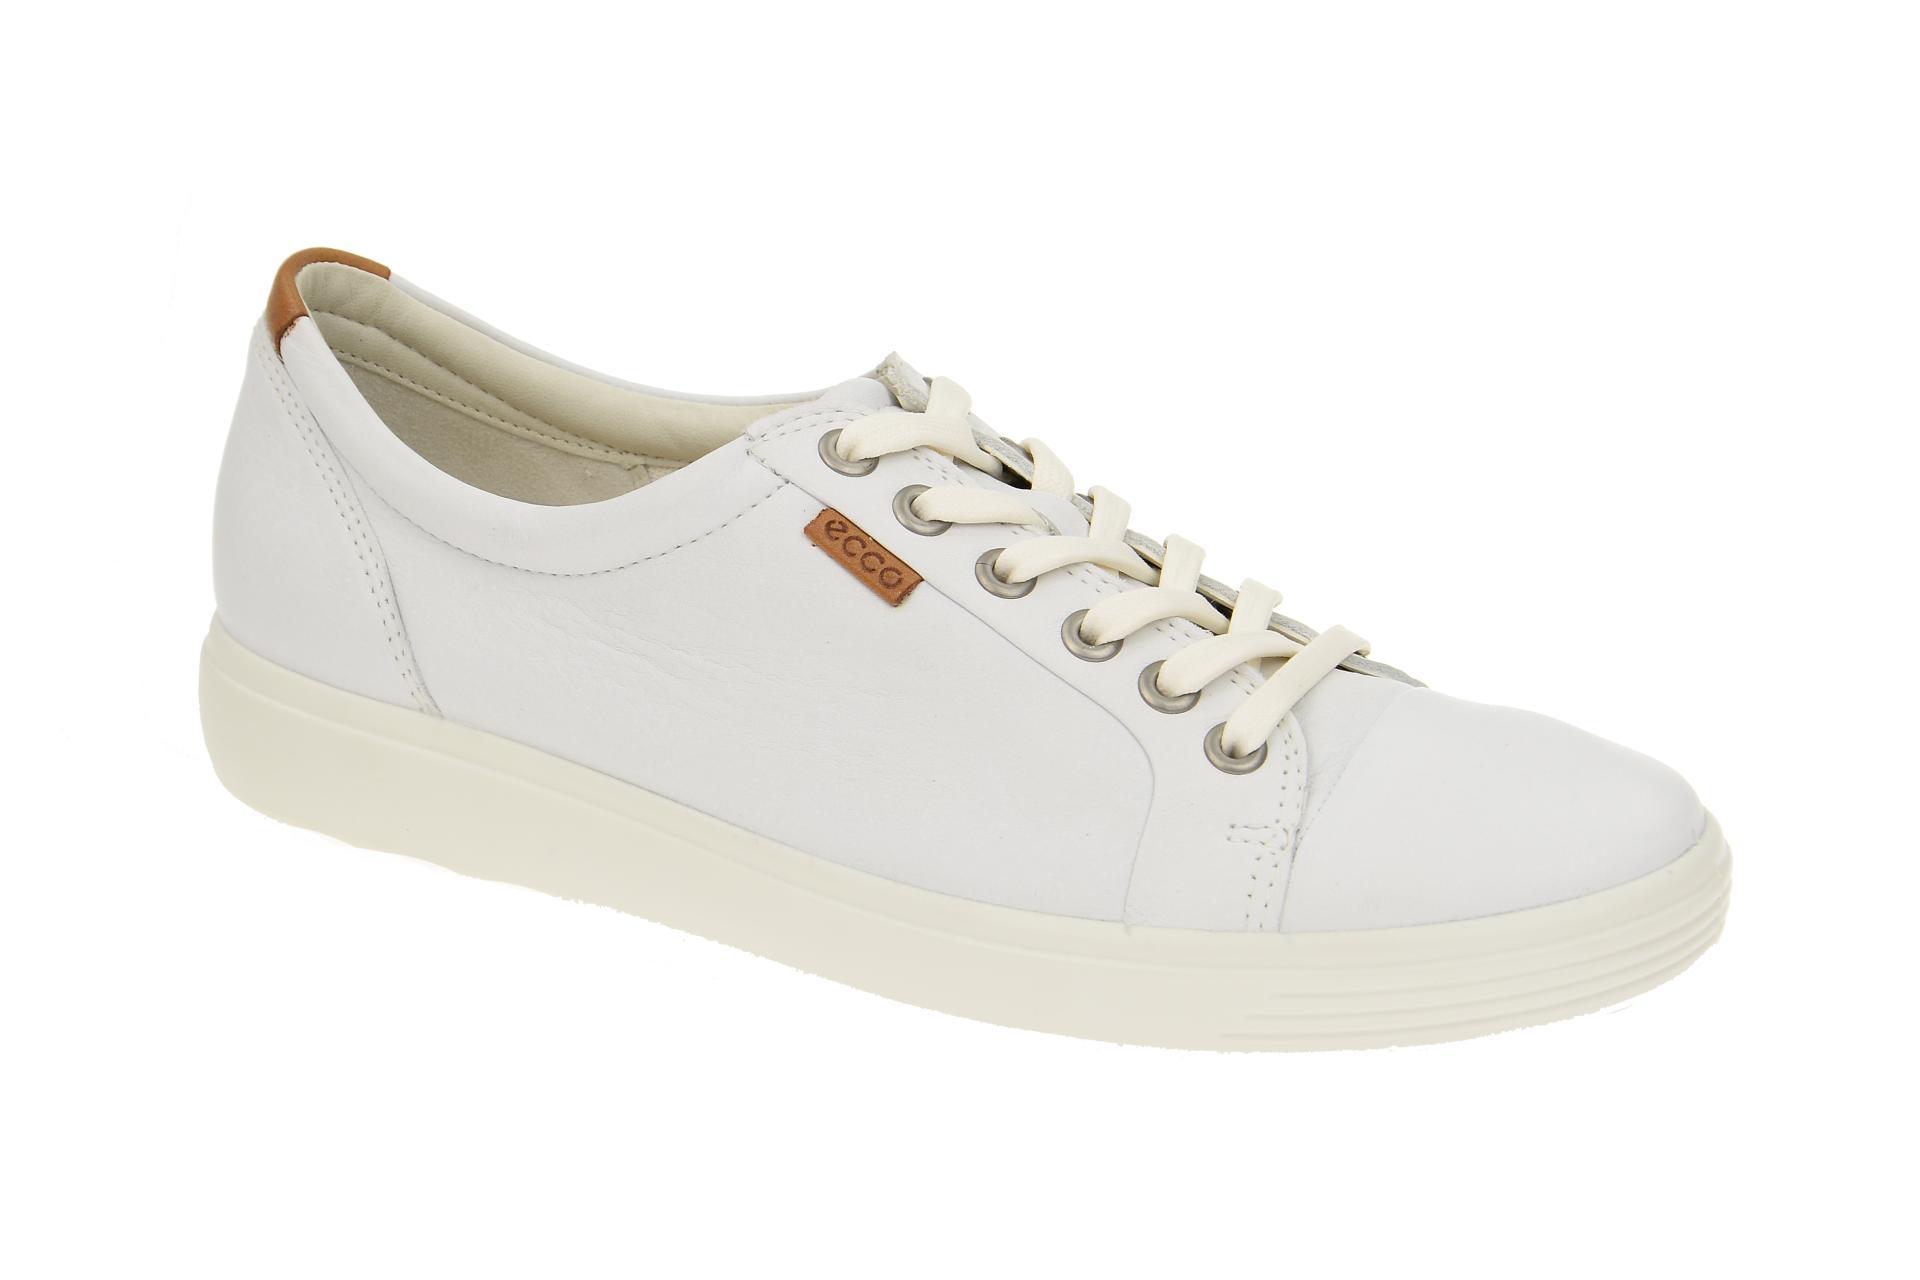 c5d36eec5da5a2 Ecco Soft 7 Schuhe weiß Damen Sneakers - Schuhhaus Strauch Shop